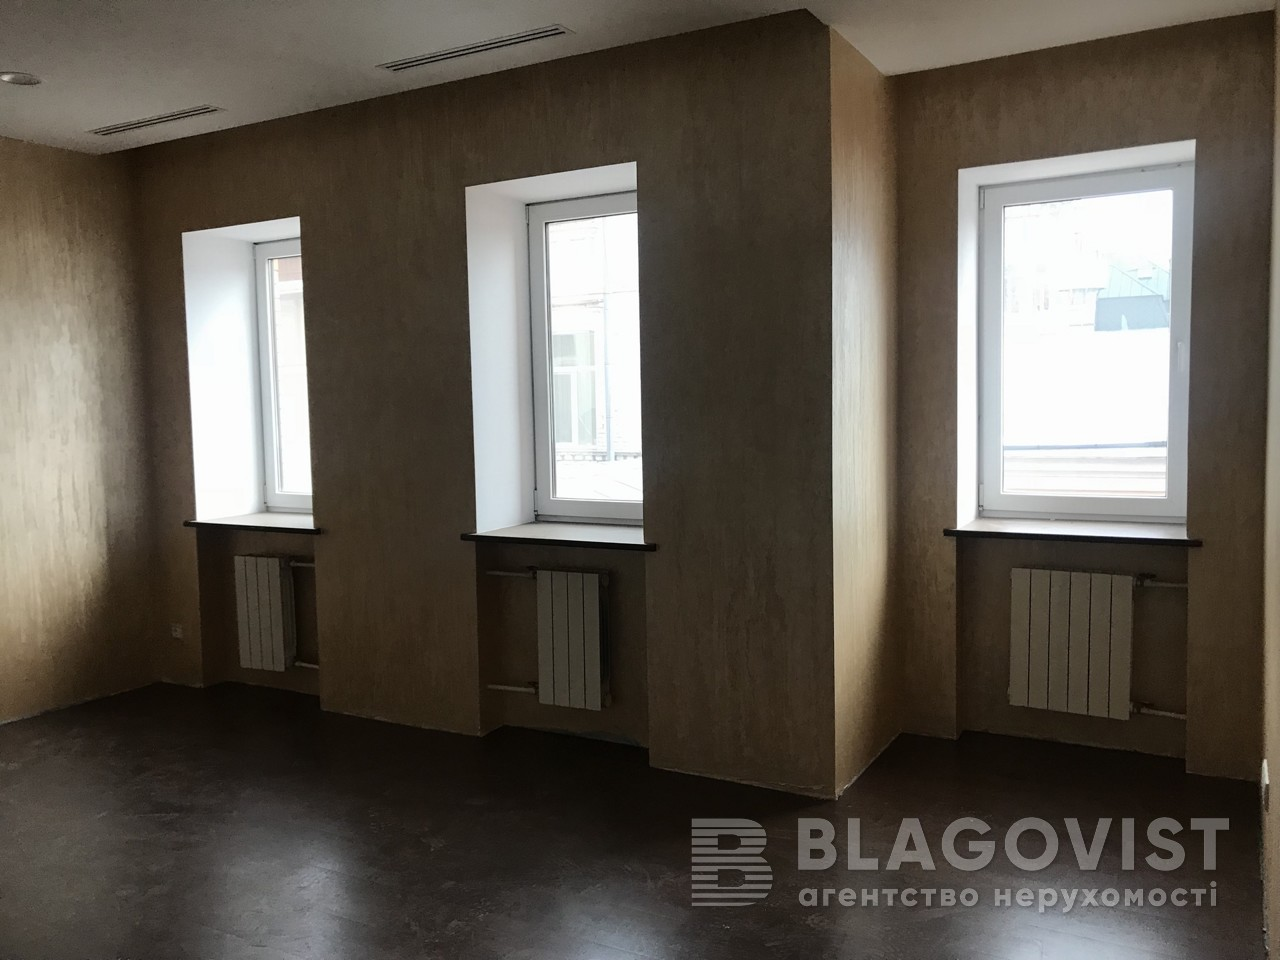 Дом, H-41424, Борисоглебская, Киев - Фото 11